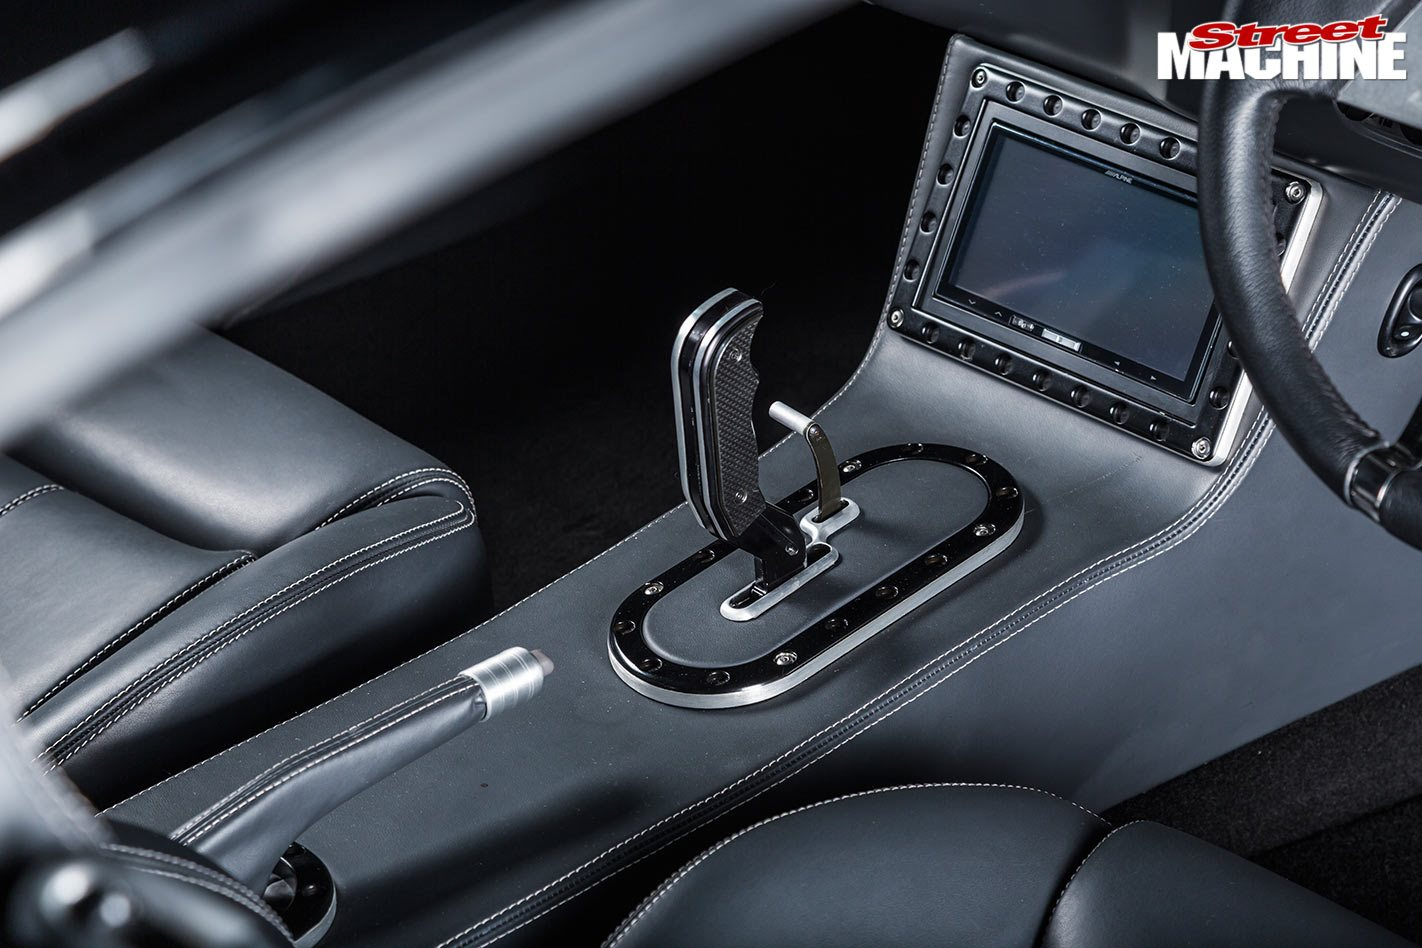 Plymouth Barracuda console